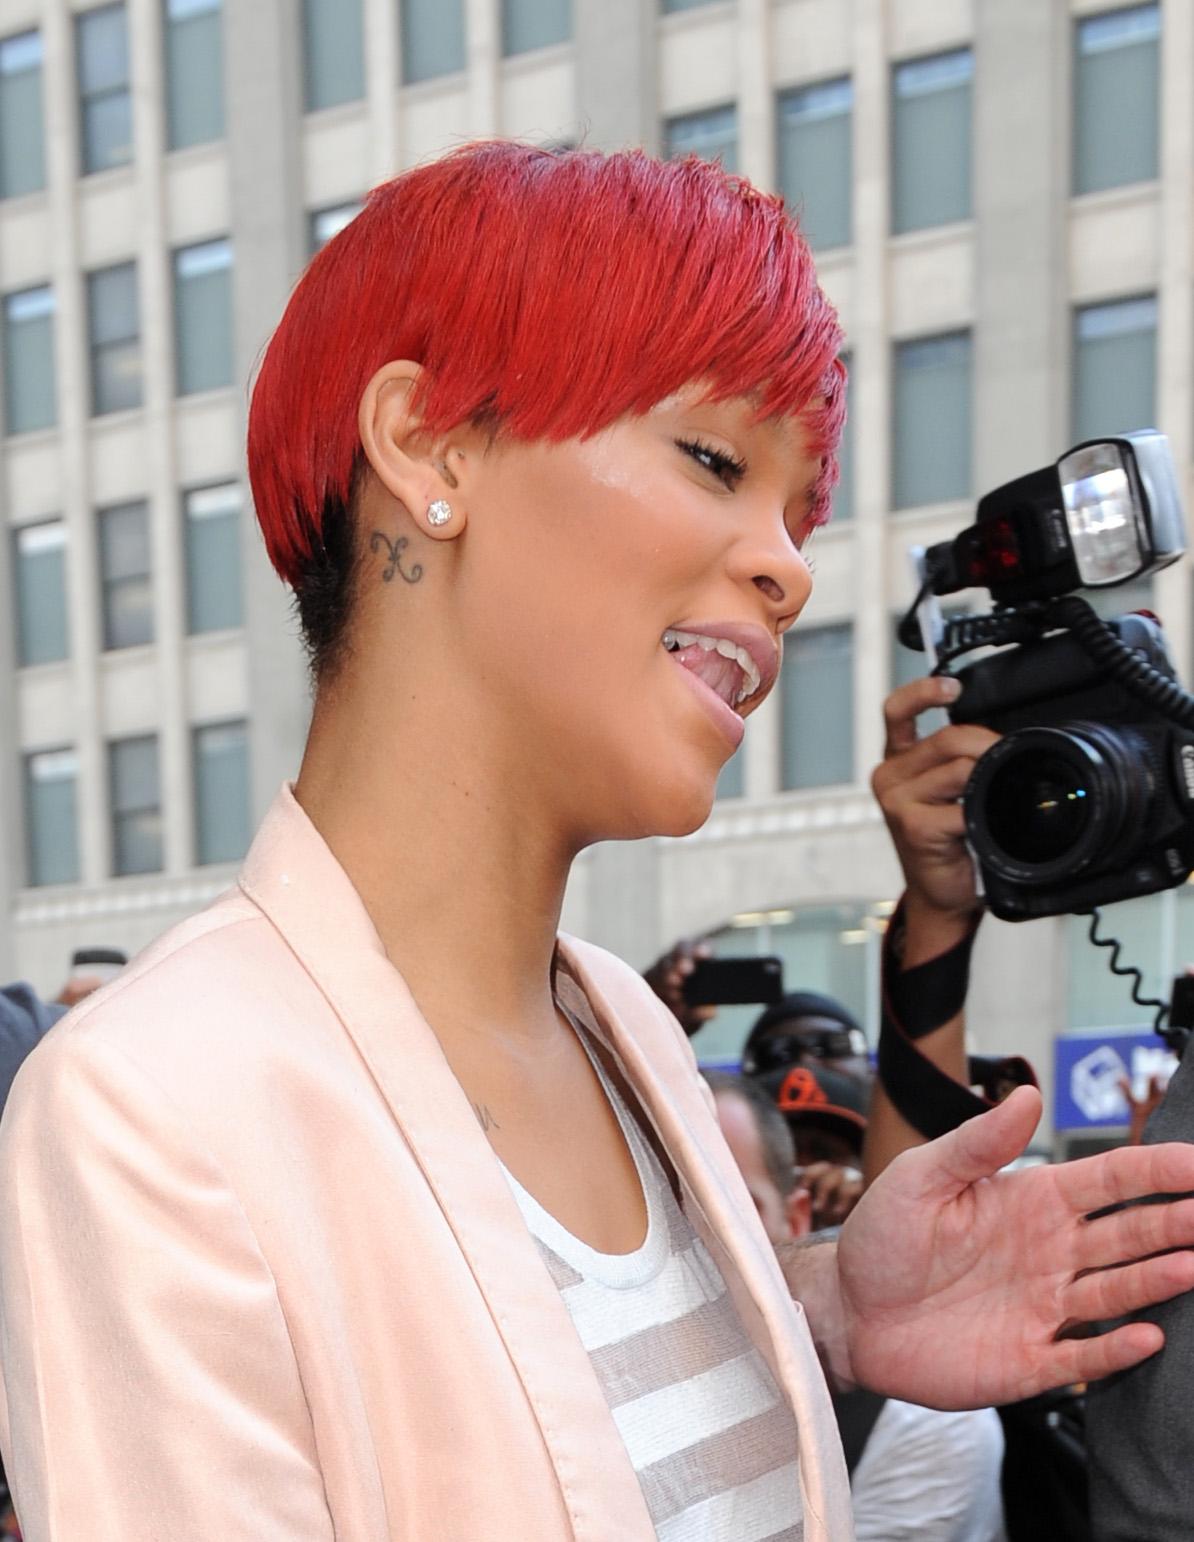 11572_Rihanna2010_08_11_leavestheTrumpSohohotelinNY.com_TheElder_Rihanna2010_08_11_leavestheTrumpSohohotelinNY21_122_465lo.jpg